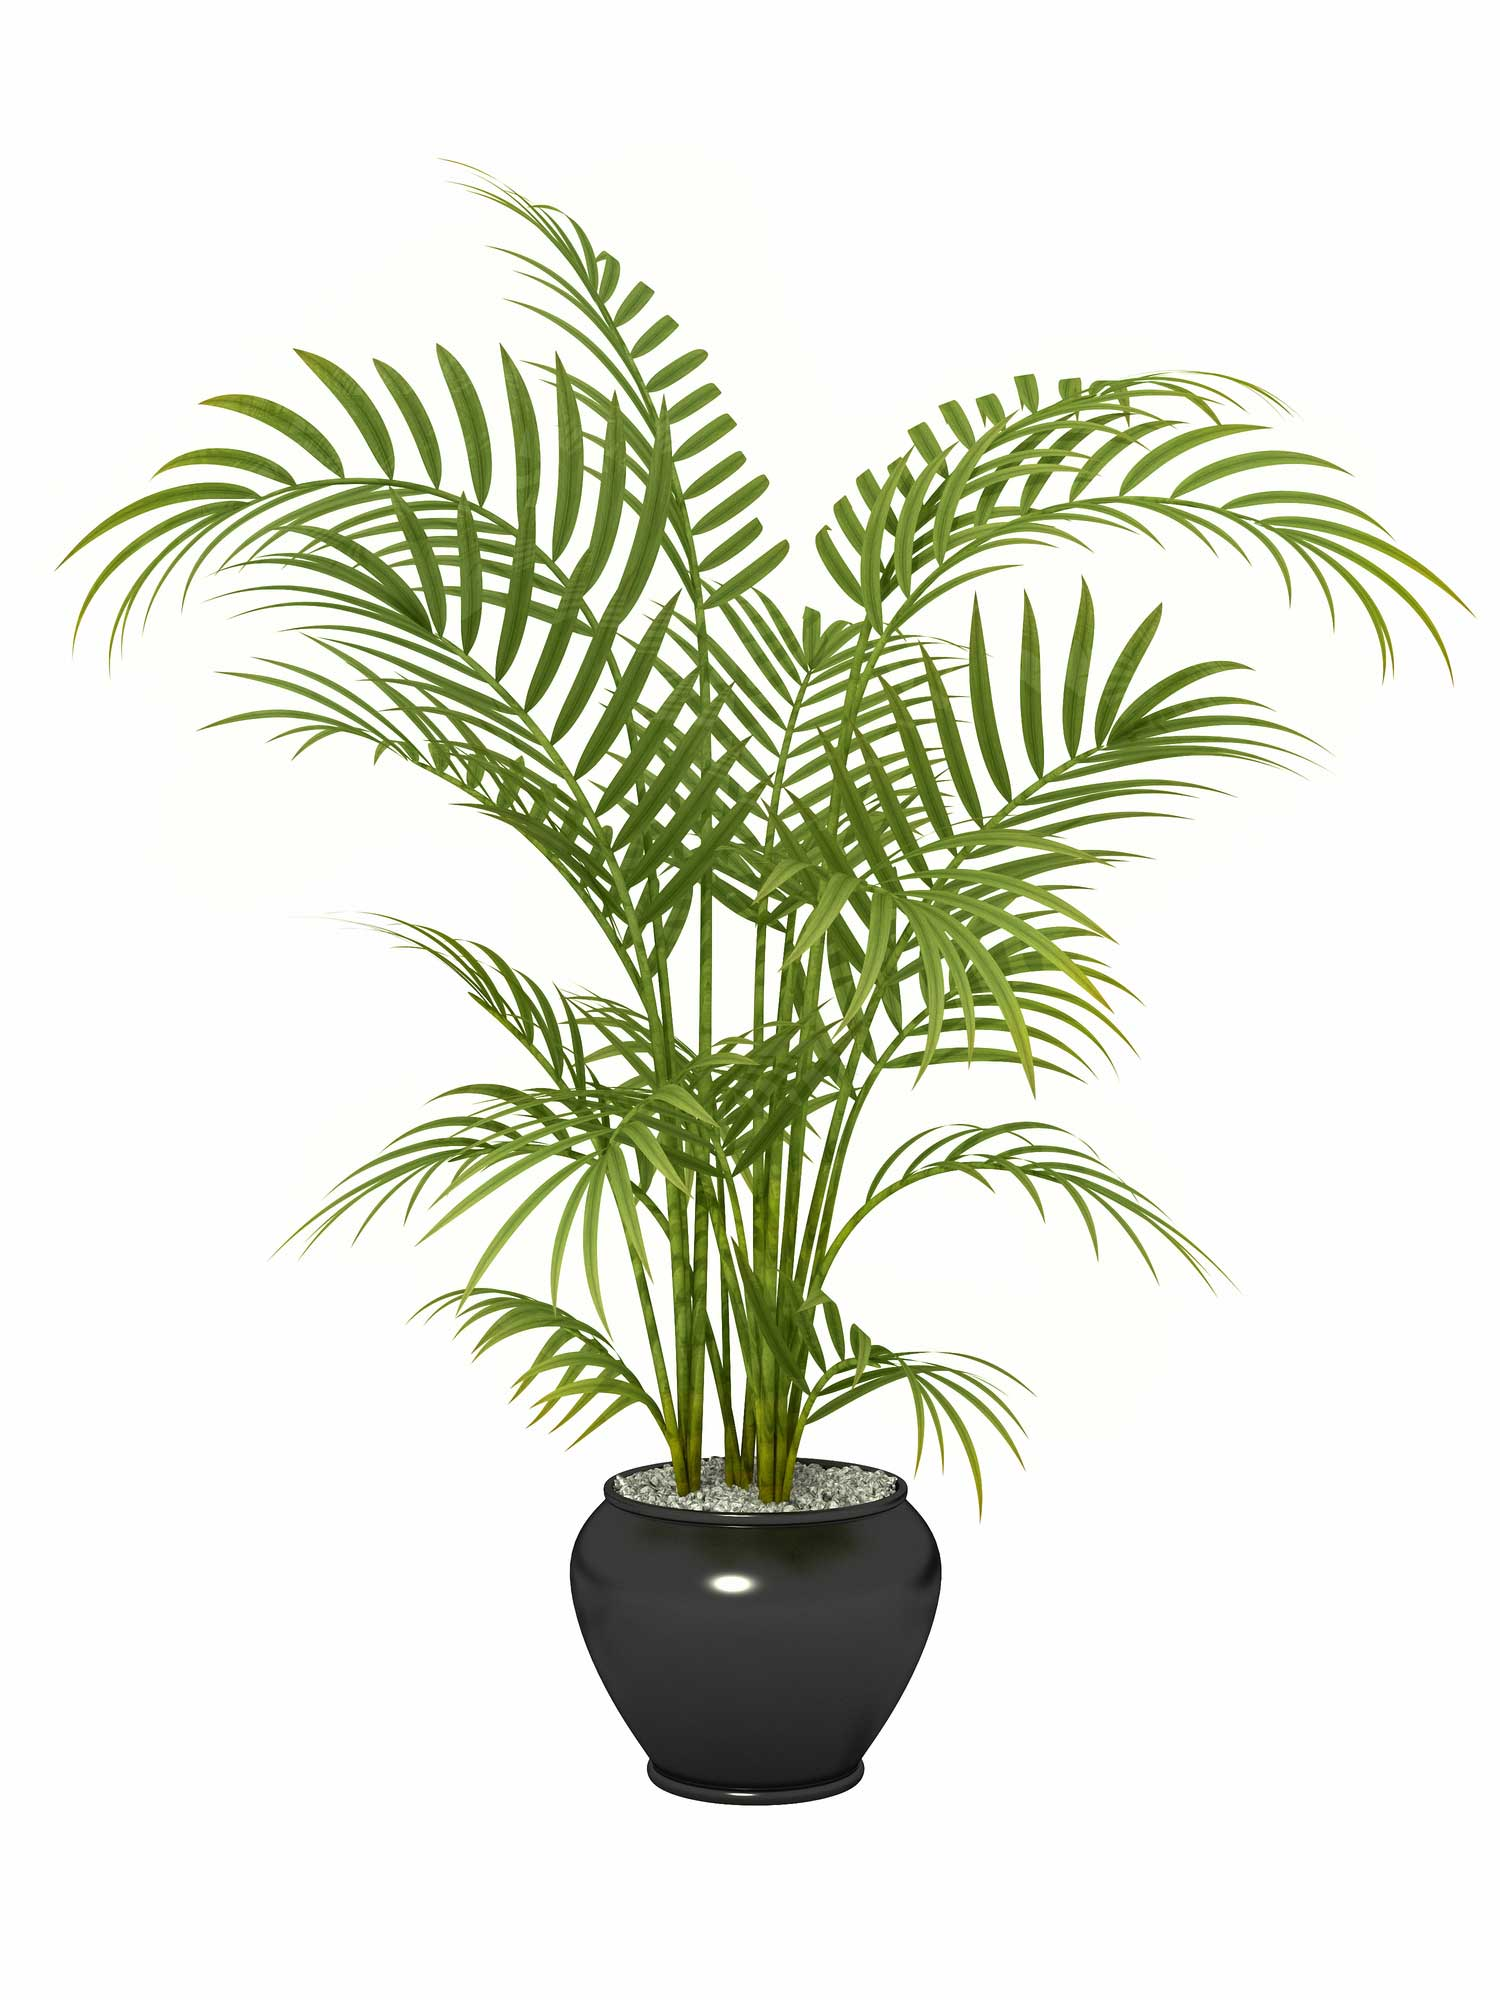 1. Areca Palm